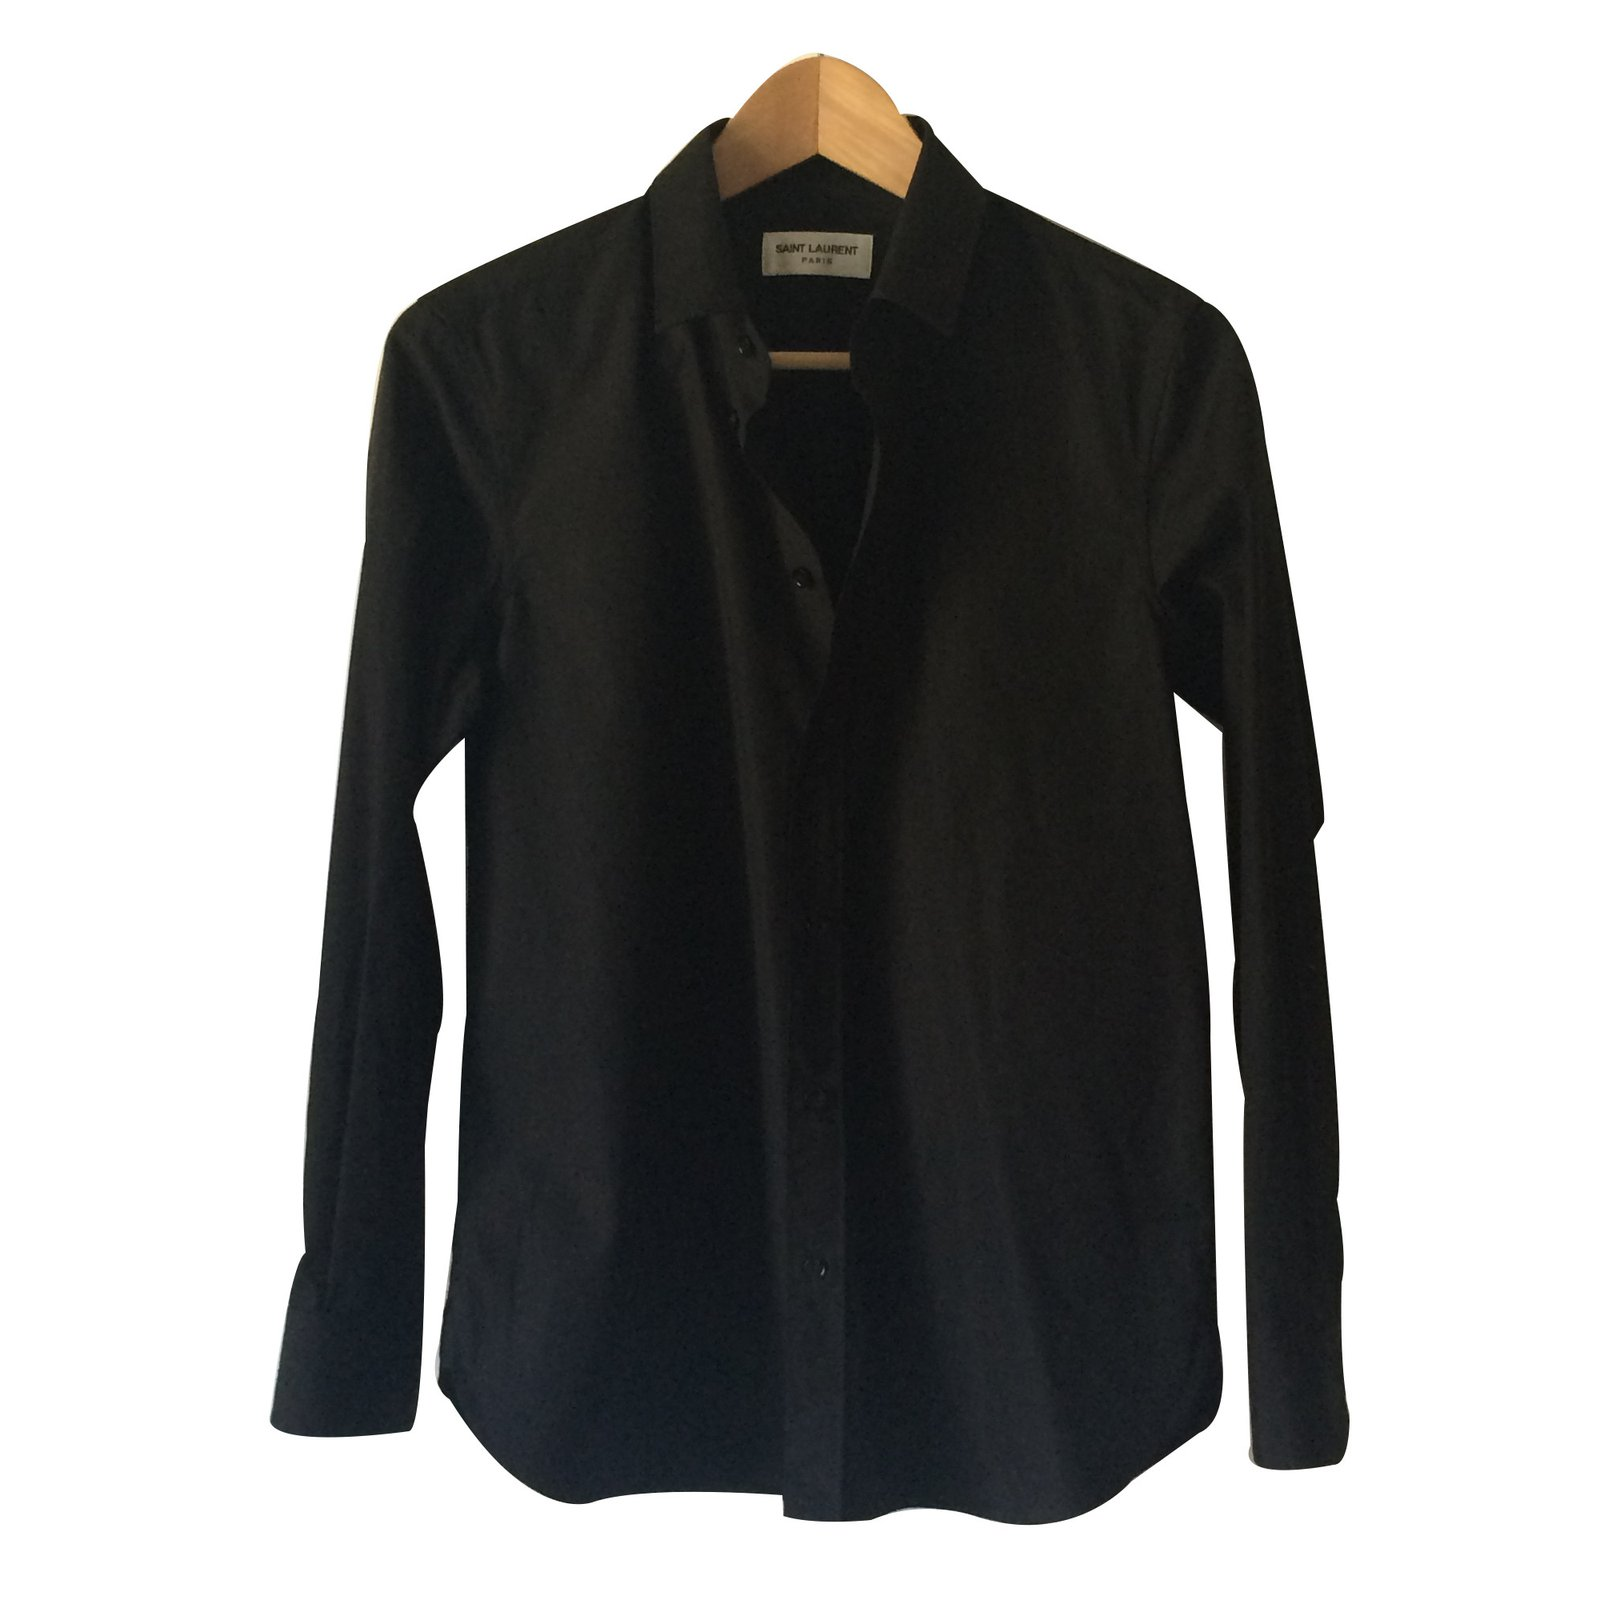 Saint laurent shirt tops cotton black joli closet for Saint laurent shirt womens